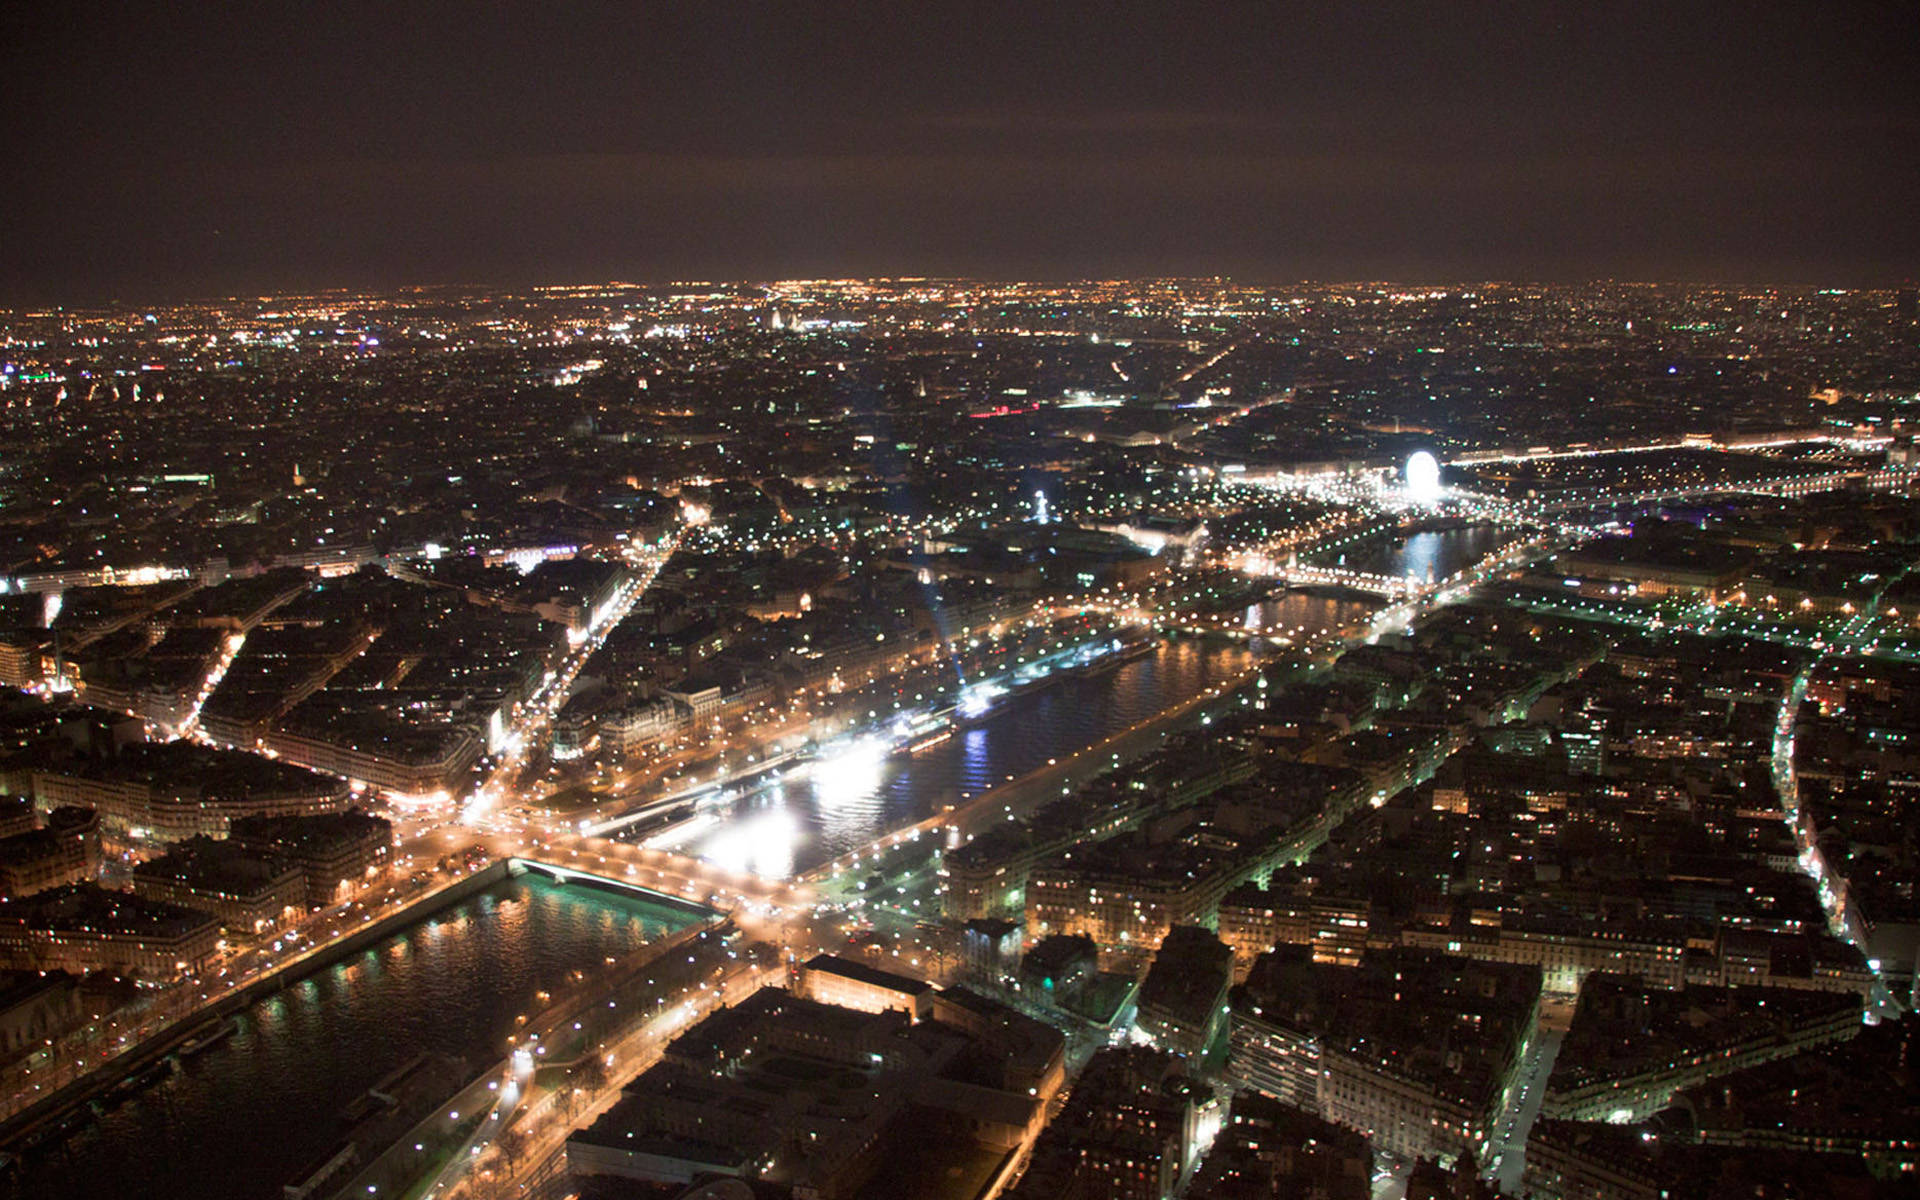 Paris City Night Light View Wallpaper 1920x1200